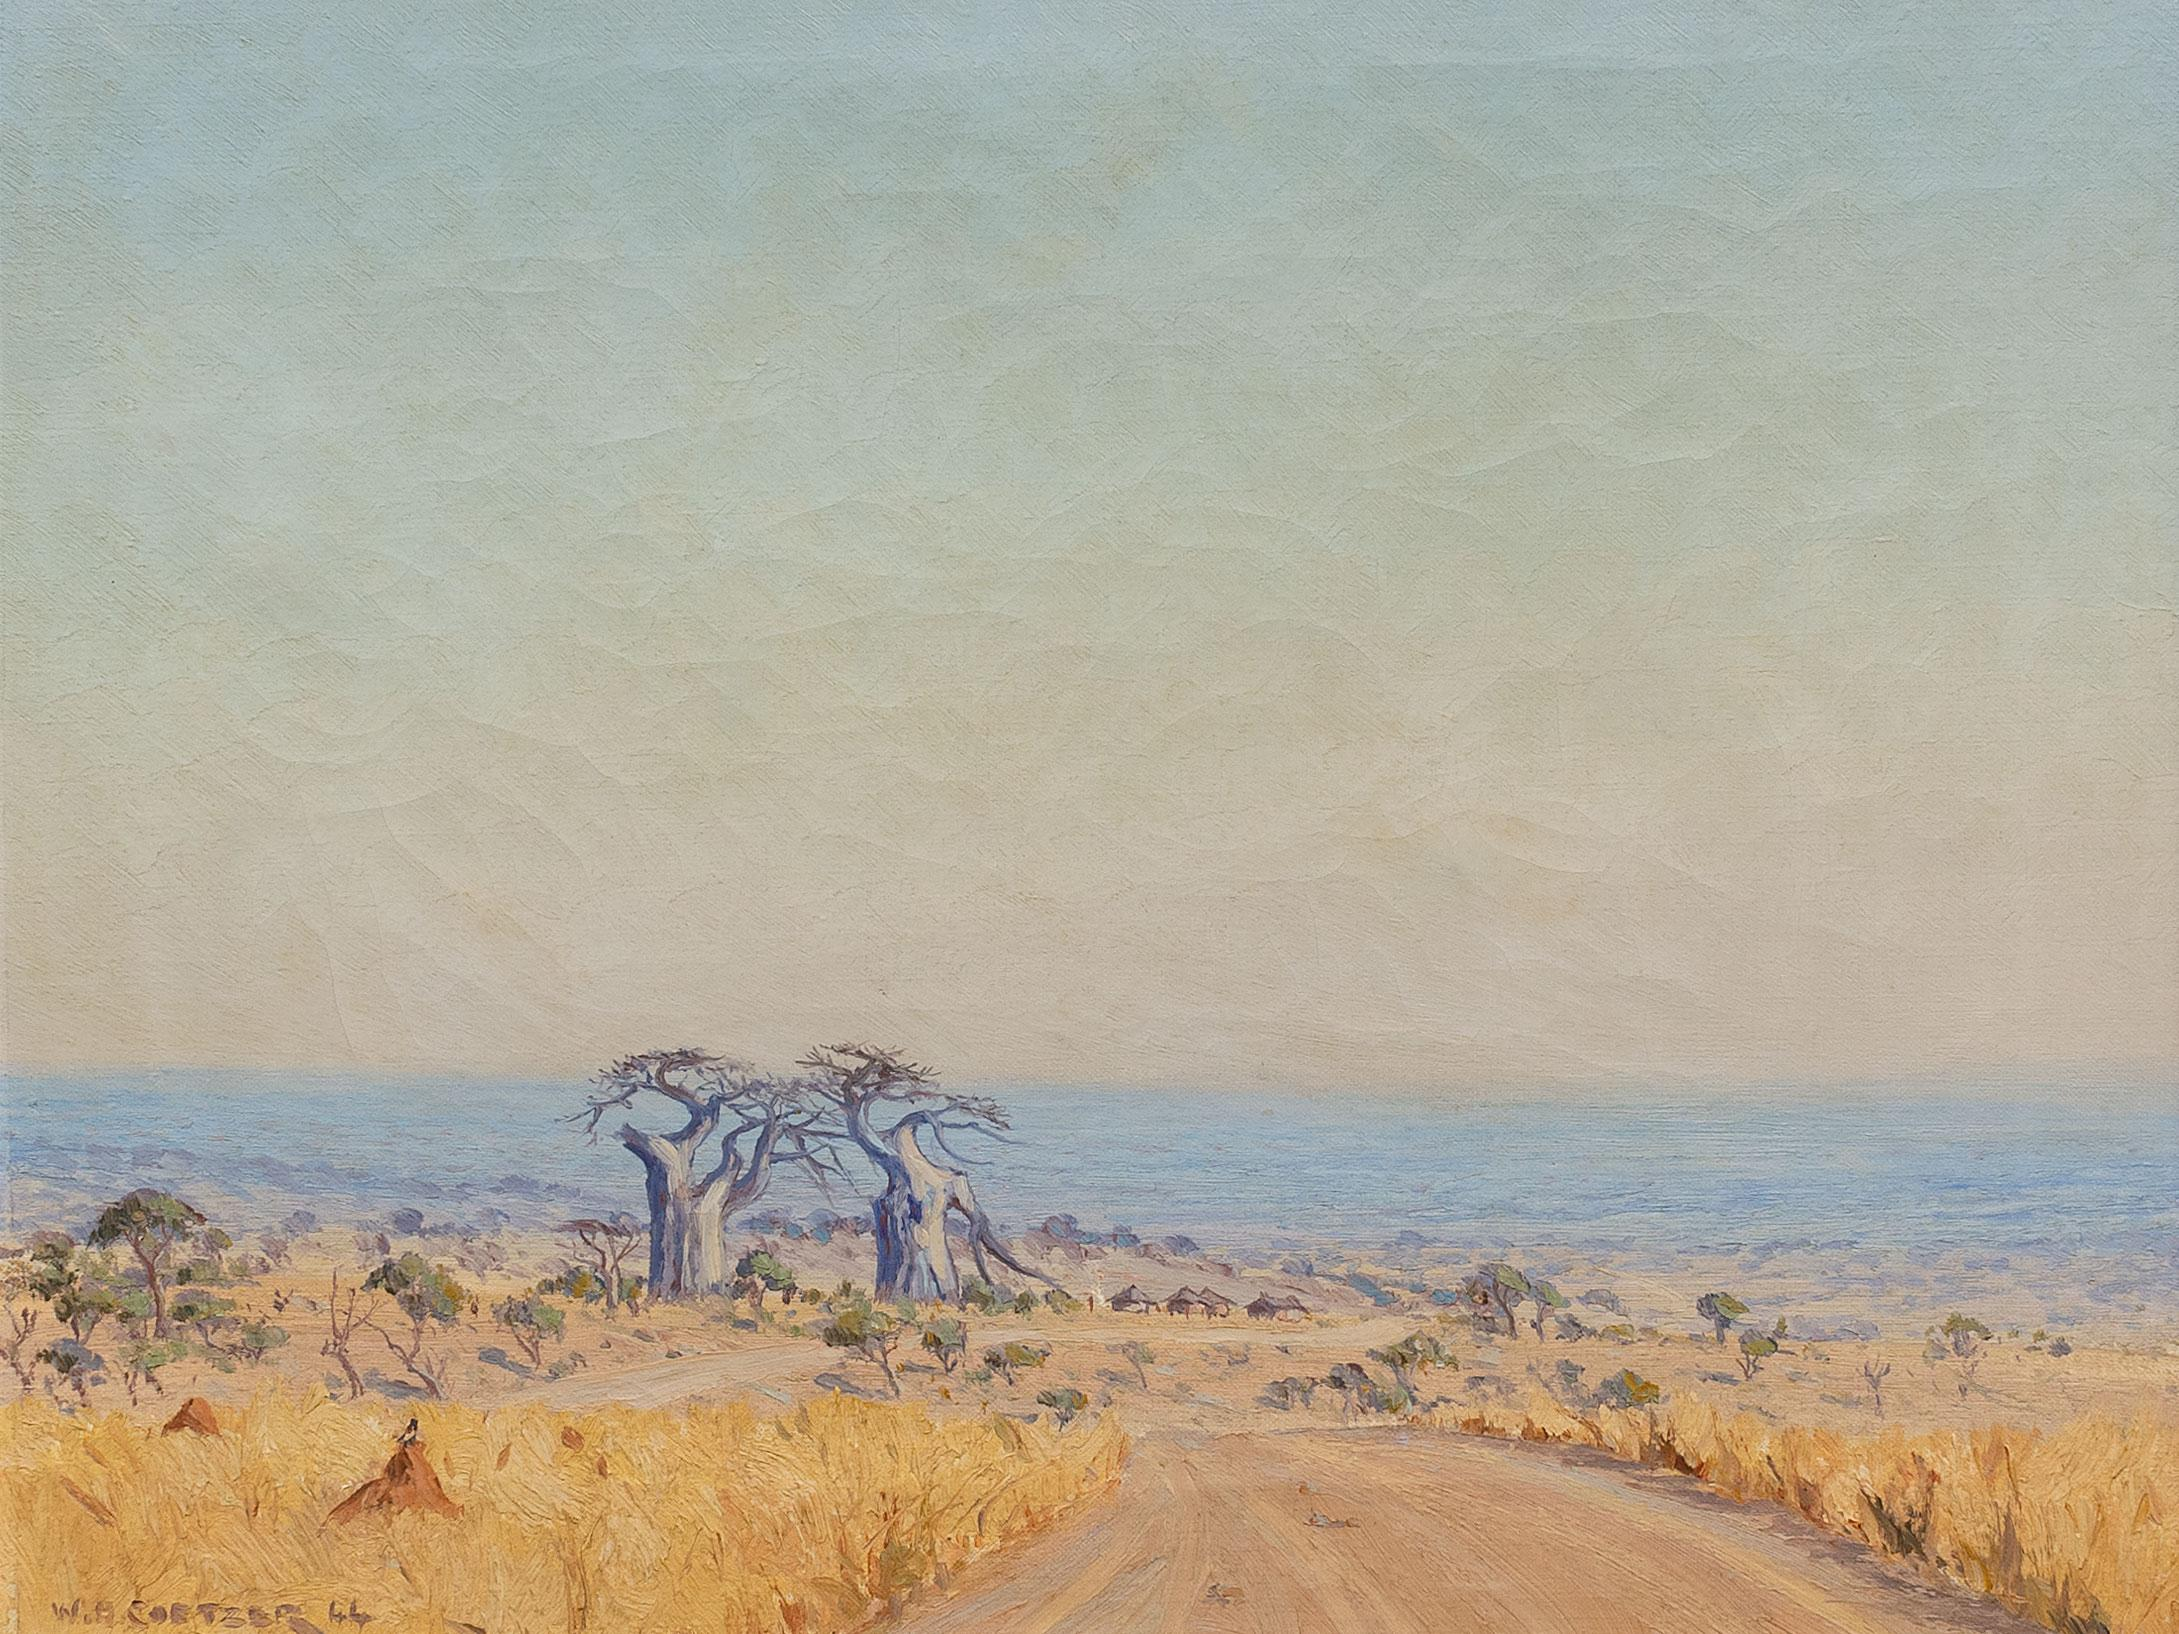 W.H. Coetzer (SA 1900 - 1983) Oil, Baobab Landscape, Signed & Dated '44, 40 x 50